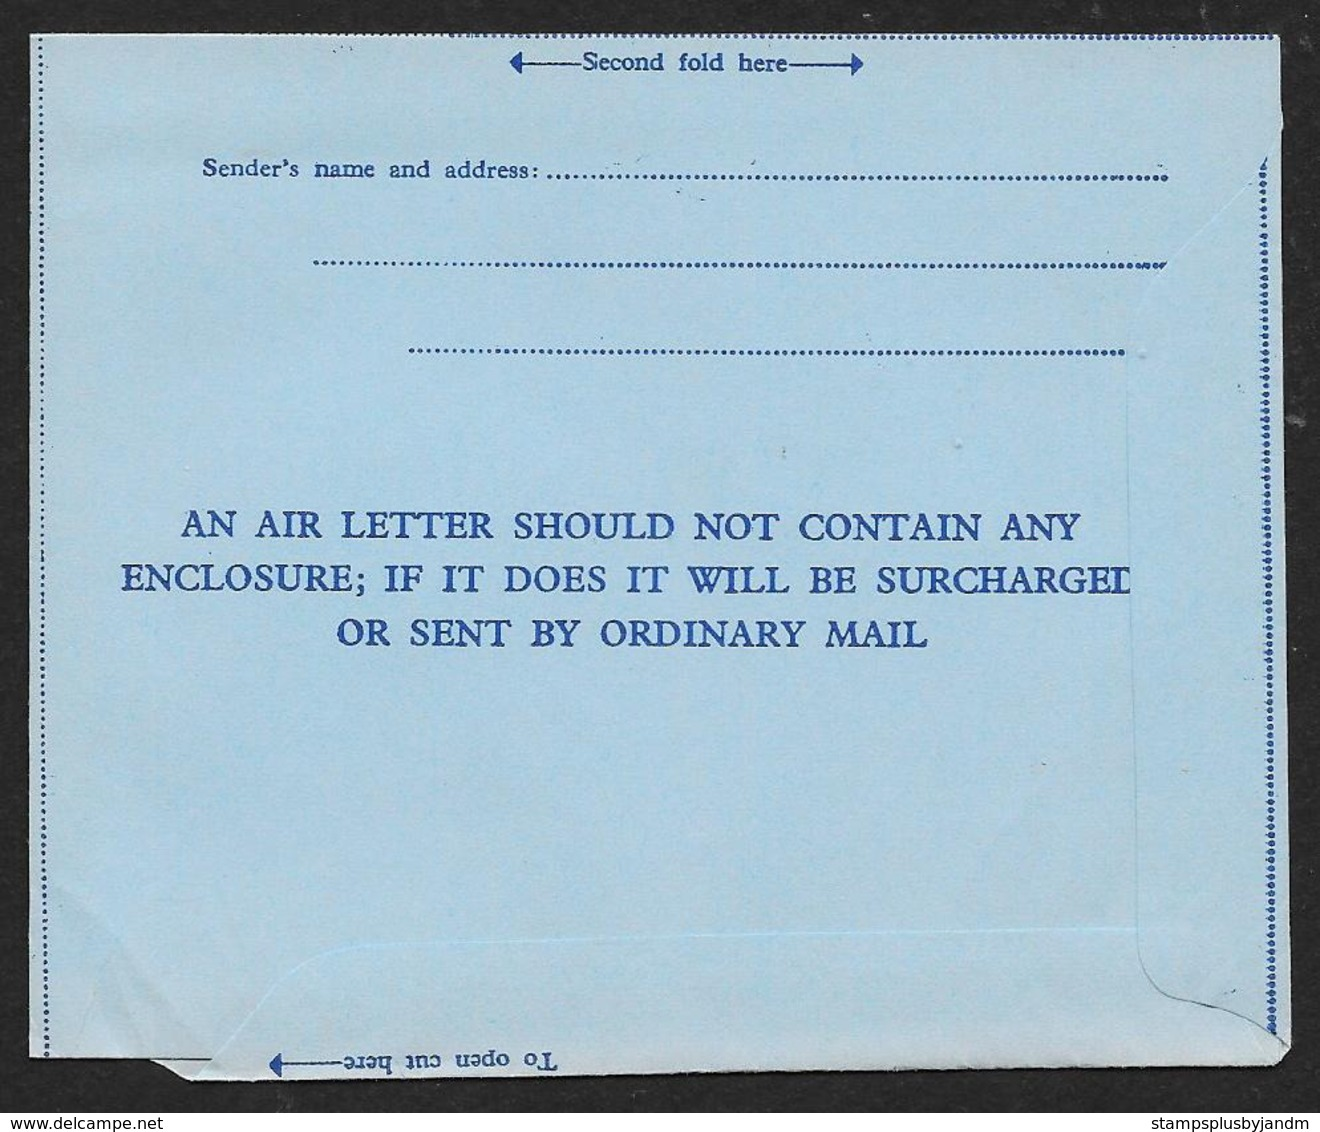 RHODESIA & NYASALAND Aerogramme Postage Paid C1950-1960s Cancel To USA! STK#X21341 - Rhodesia & Nyasaland (1954-1963)